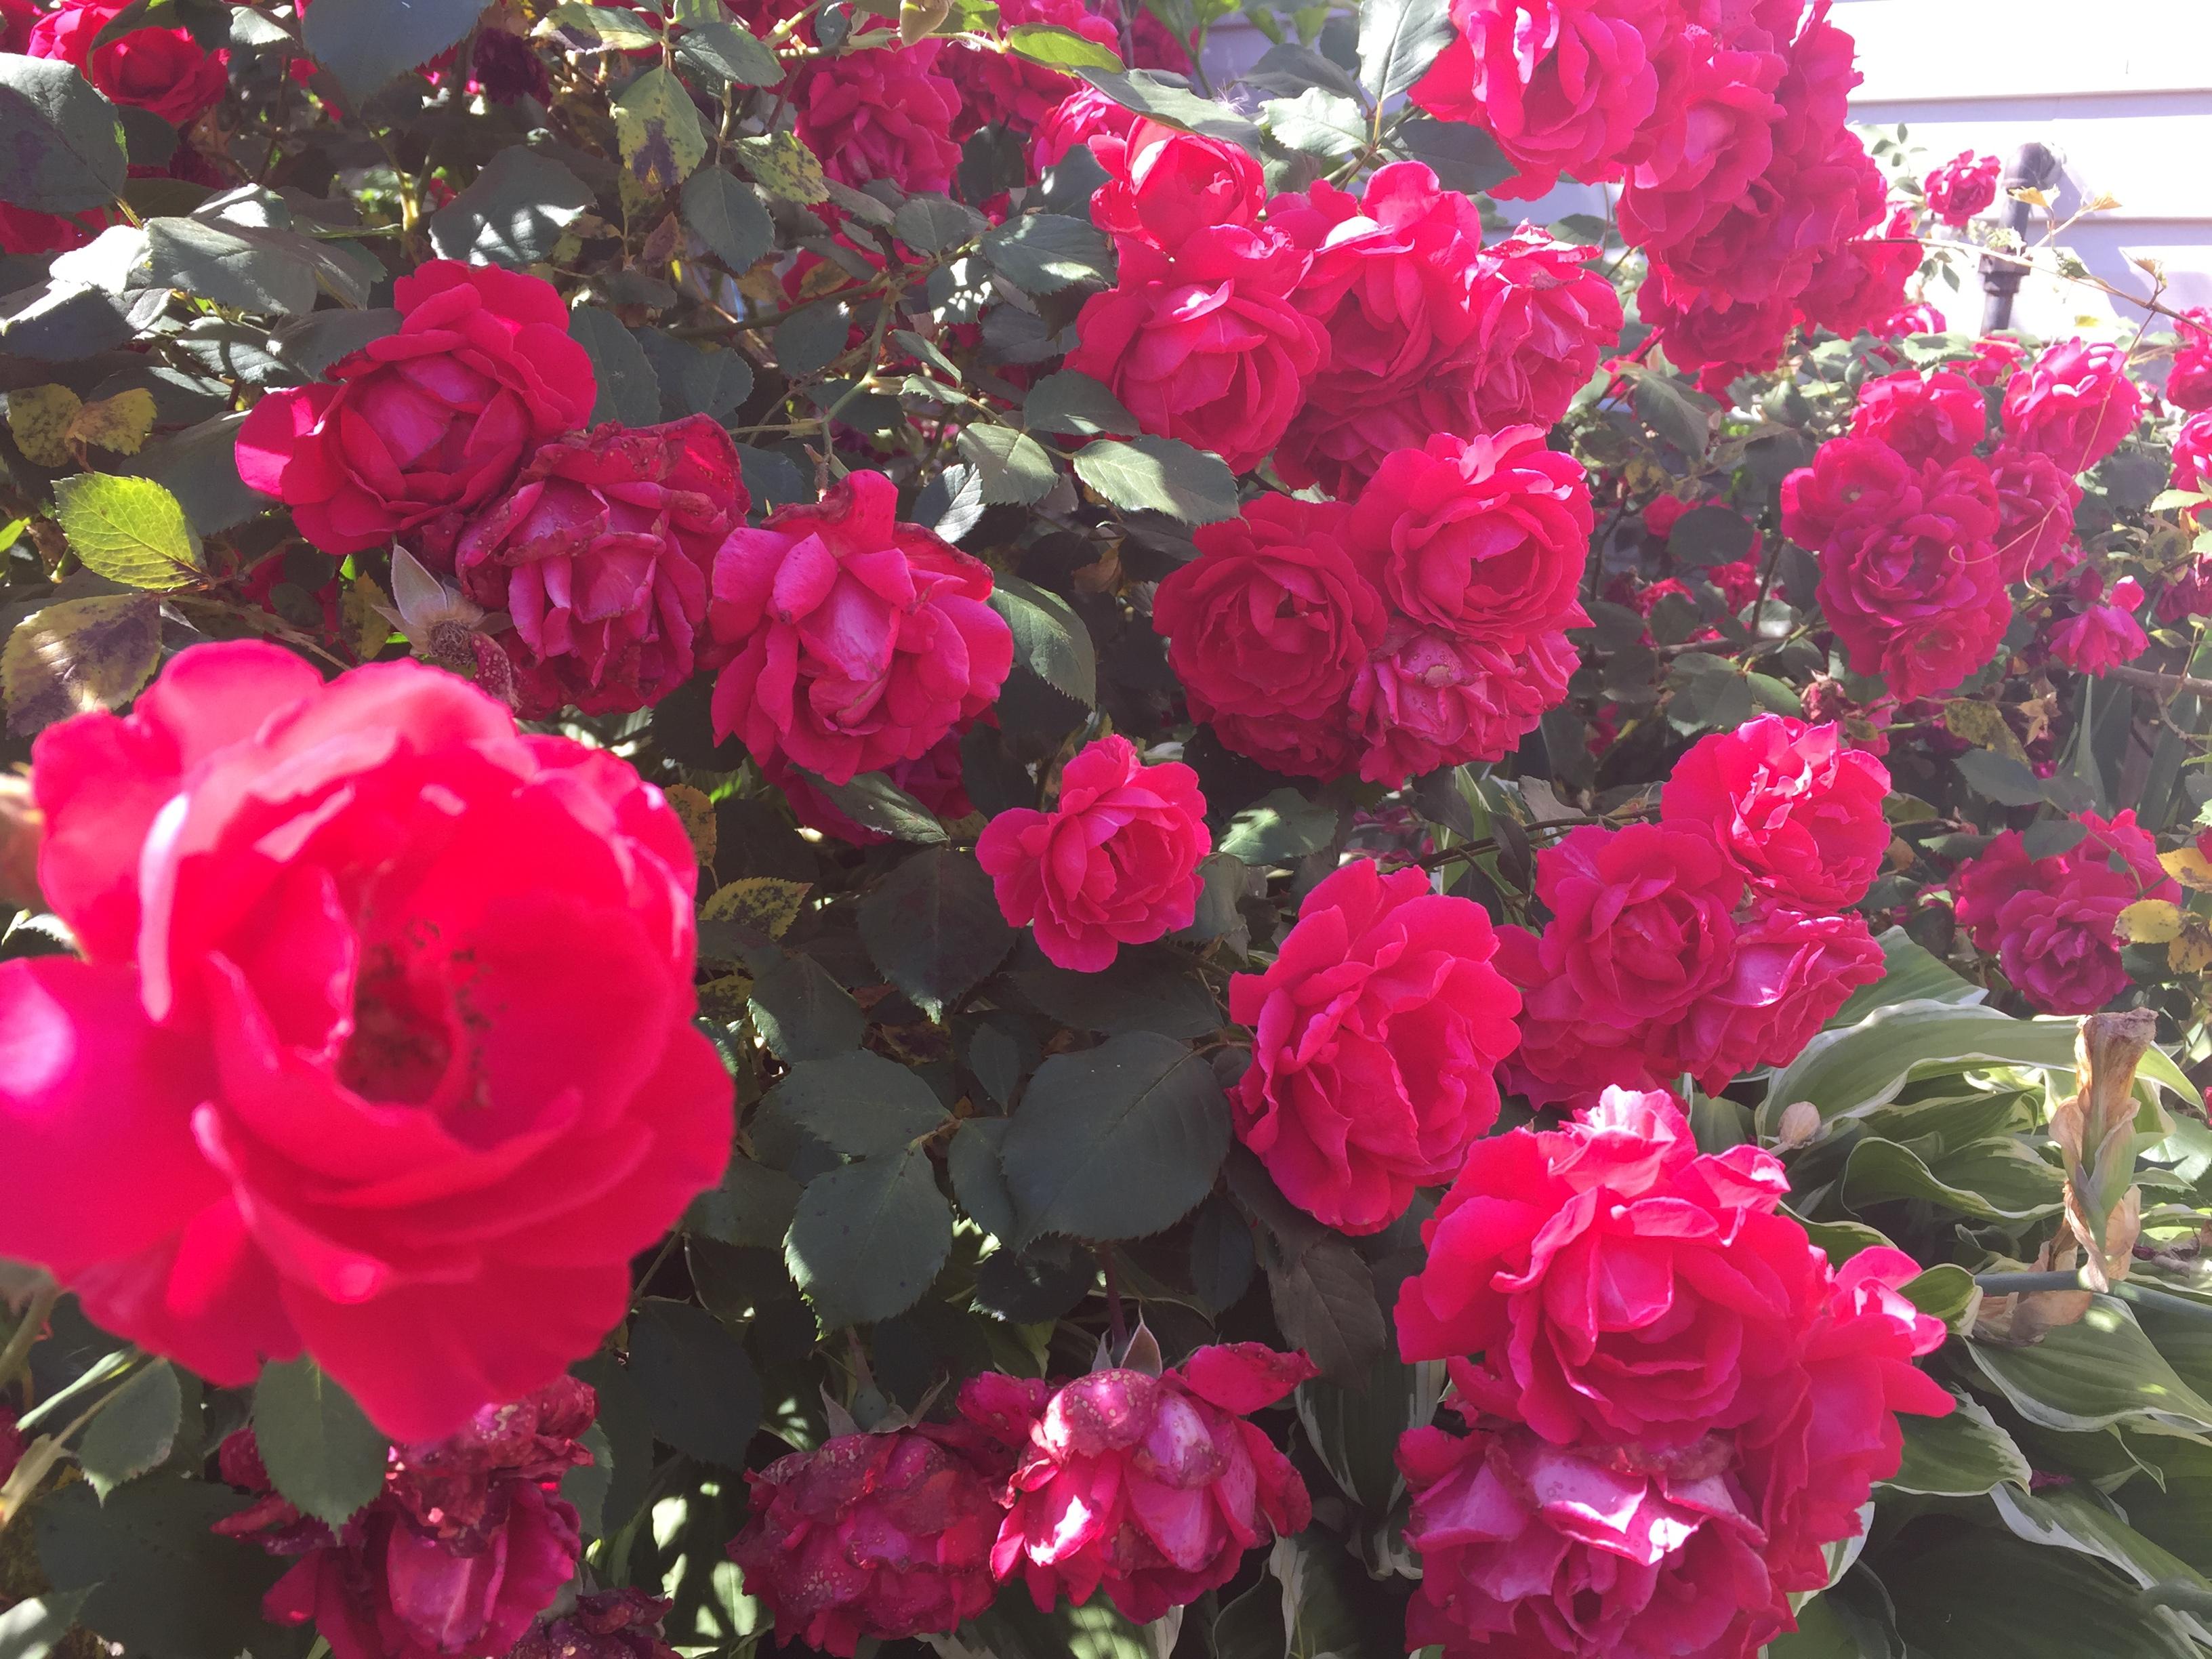 20B84F9E 08B6 47F4 8163 8AC1C25EB42D Roses in full bloom!